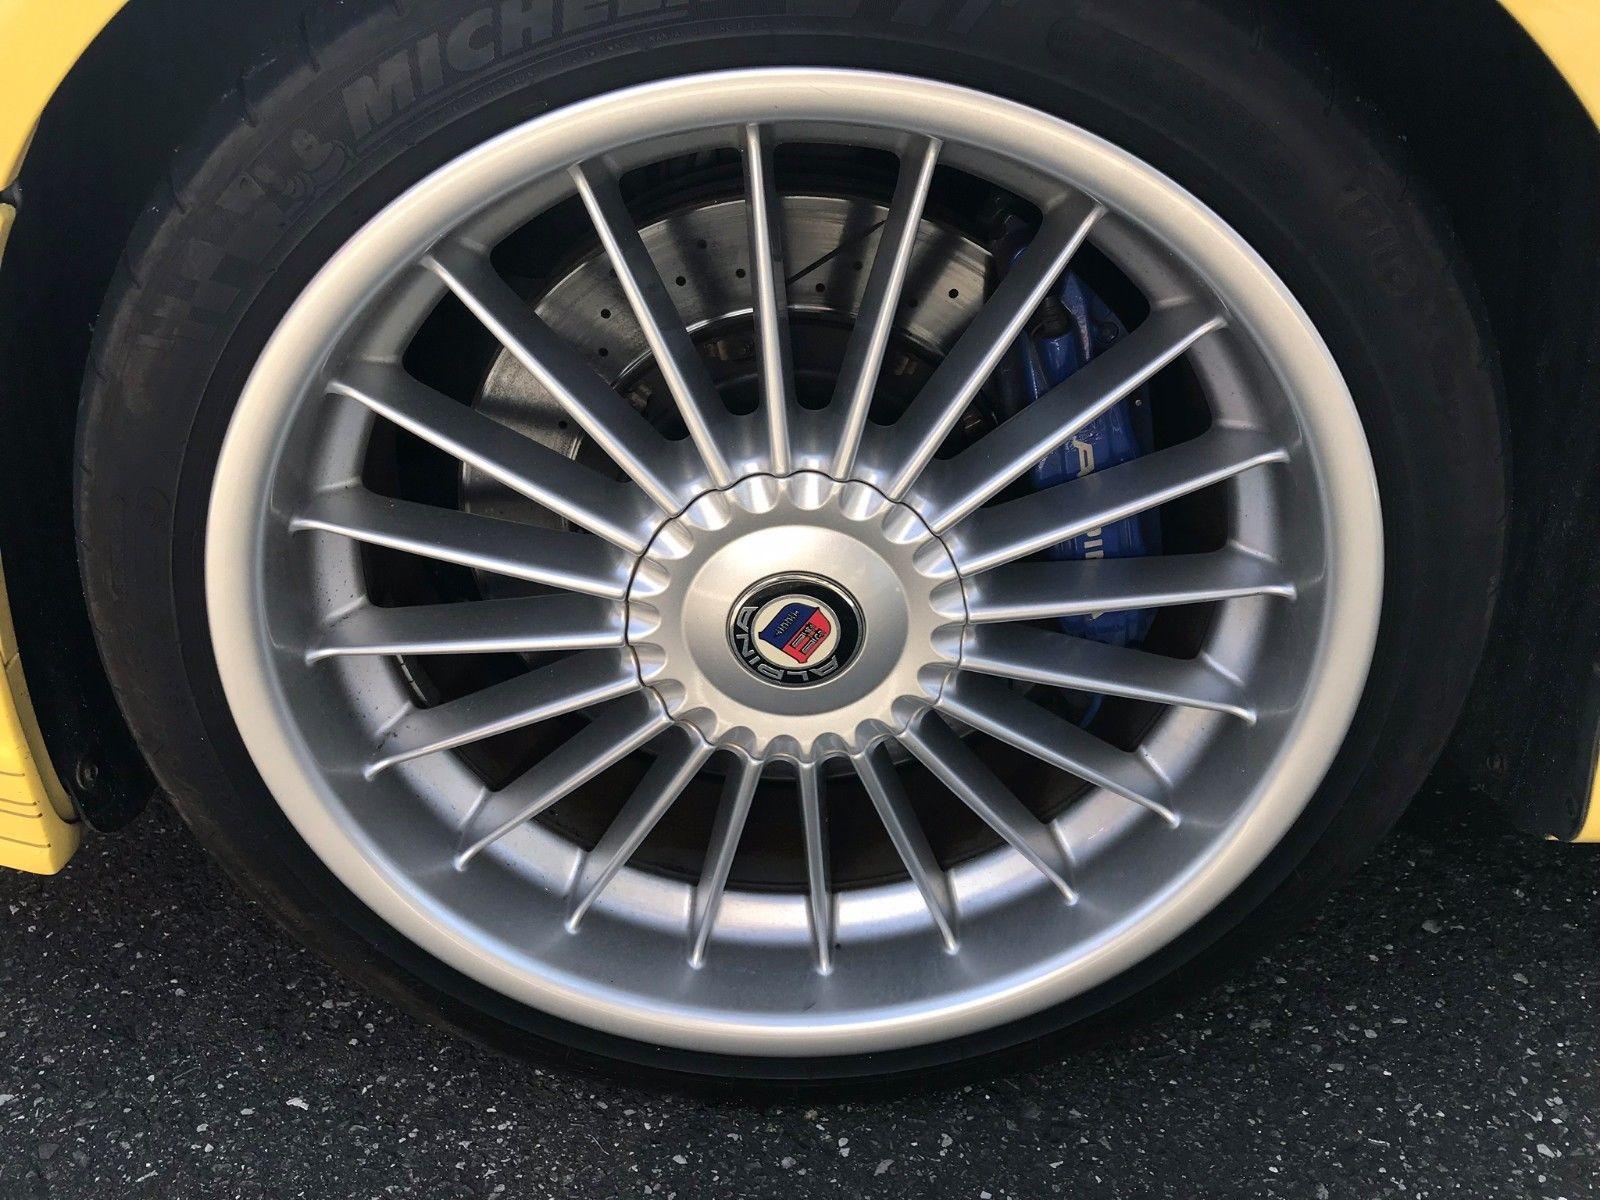 2003_Alpina_B10_V8S_Touring_0015